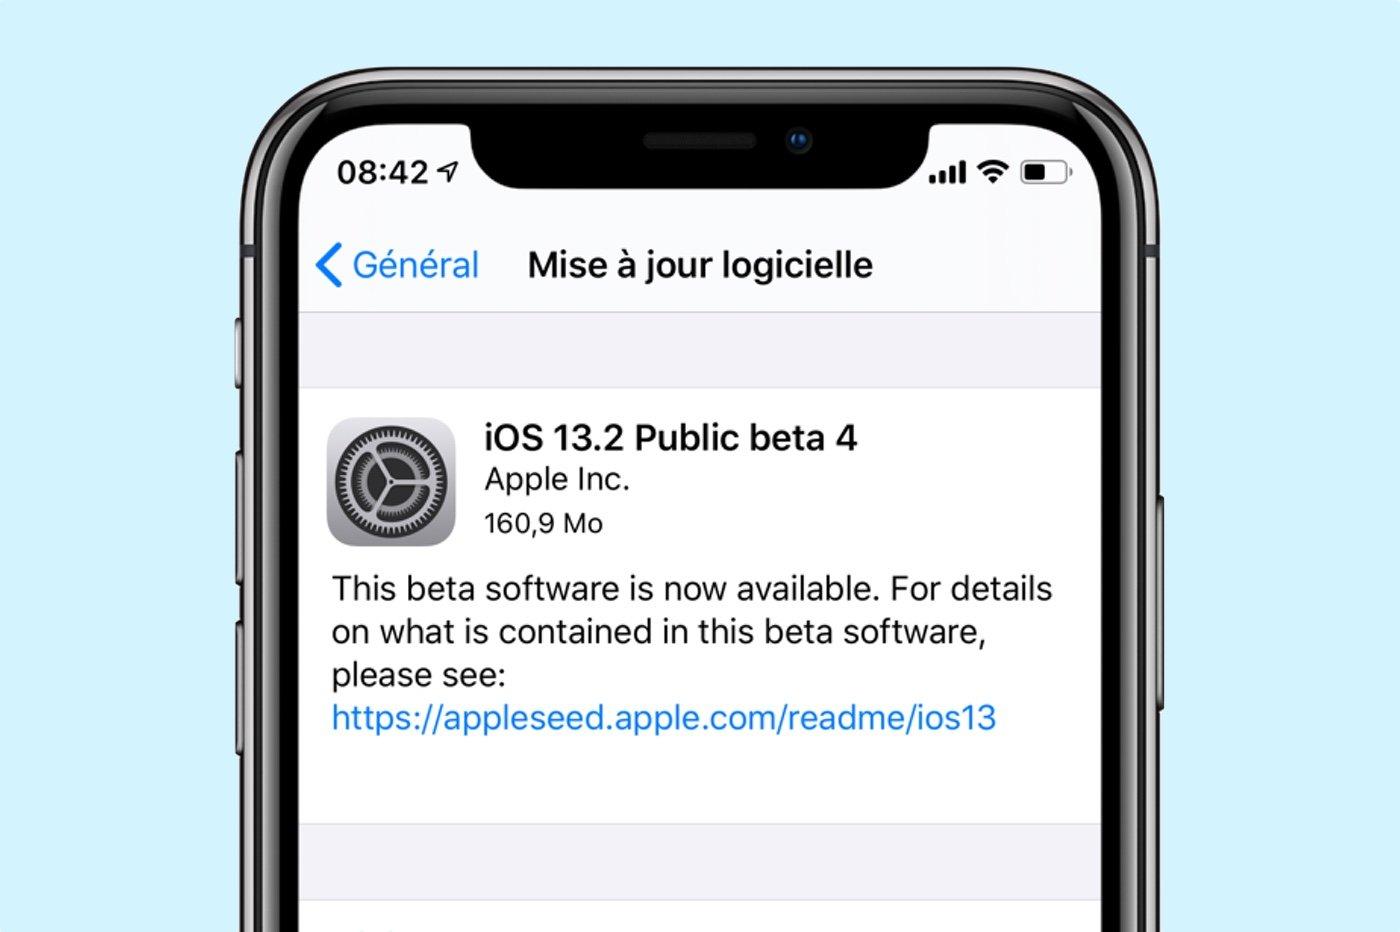 Beta 4 iOS 13.2